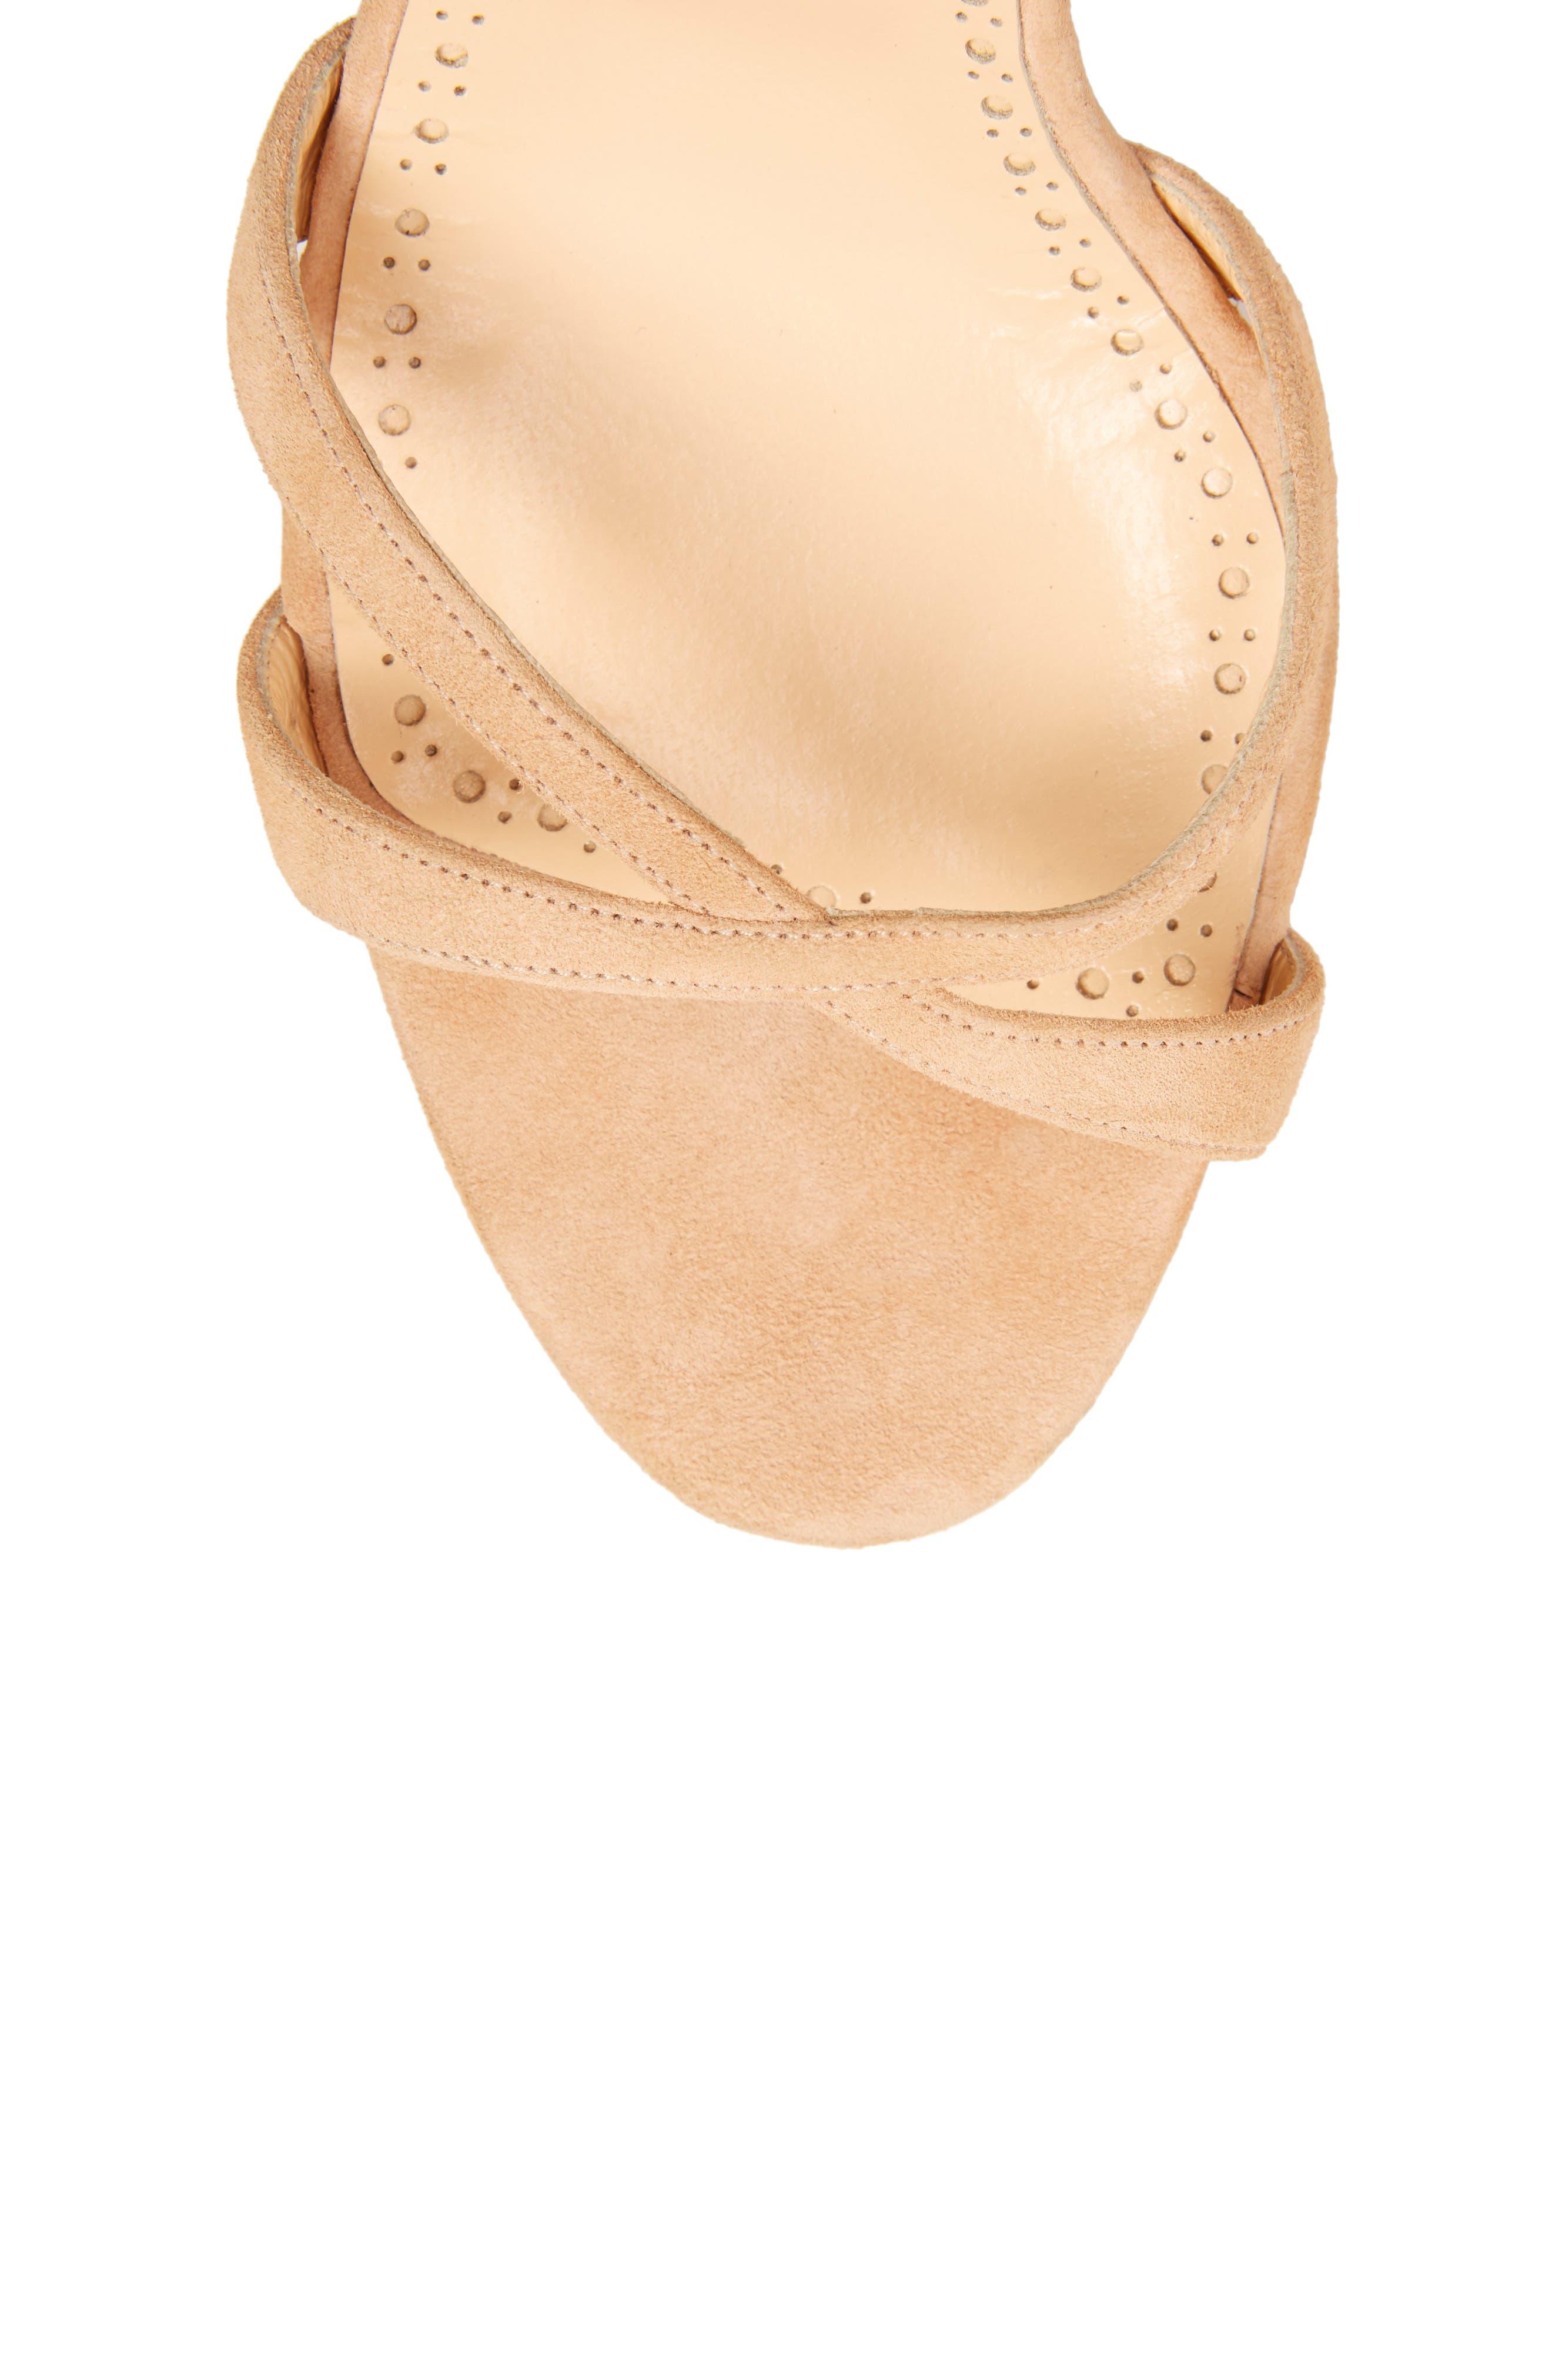 Criss Ankle Tie Sandal,                             Alternate thumbnail 5, color,                             Light Camel